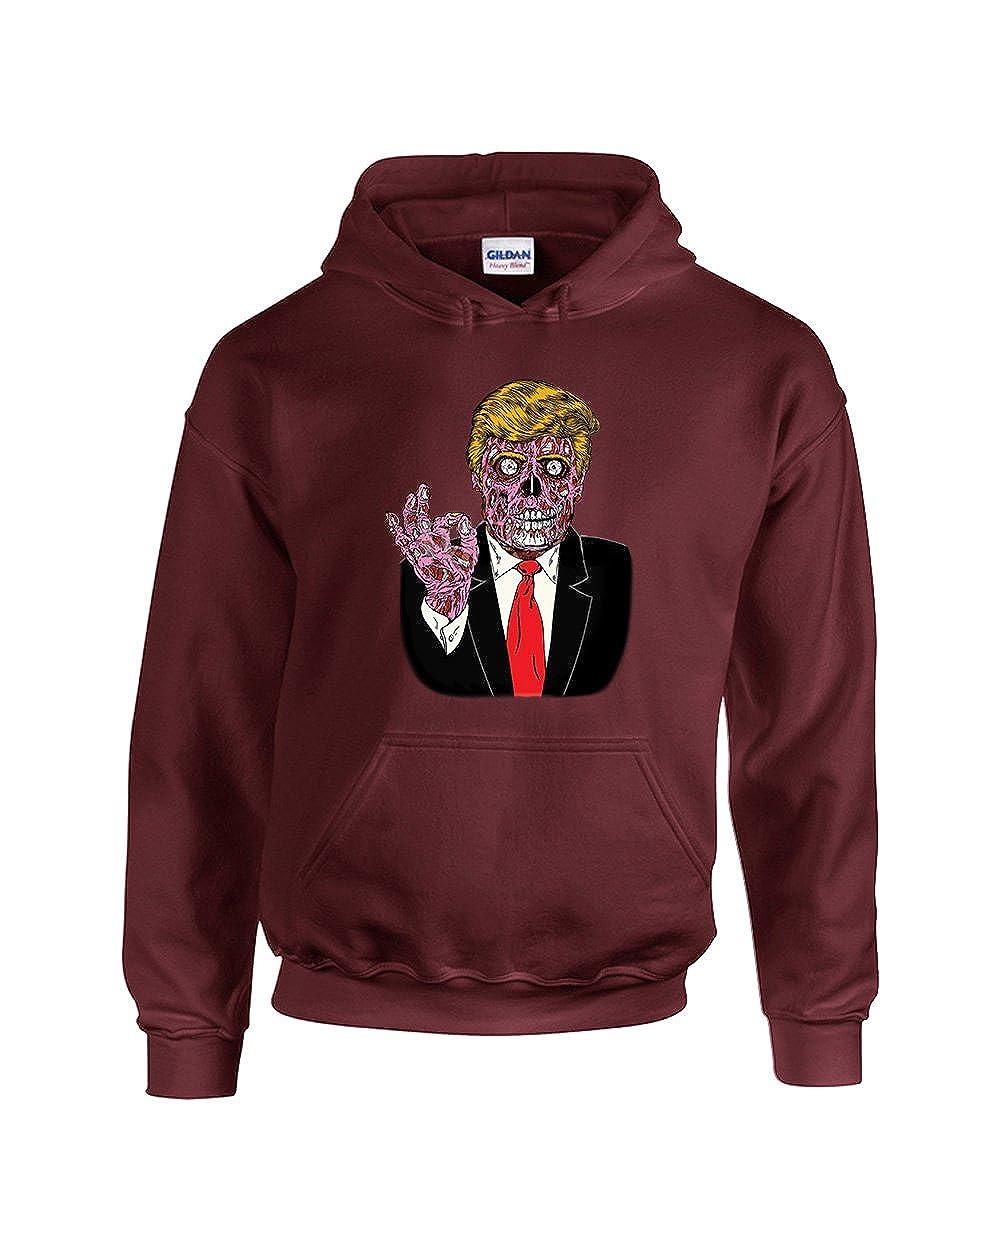 CAMALEN Trump Zombie President Funny Unisex Pullover Hoodie Hooded Sweatshirt